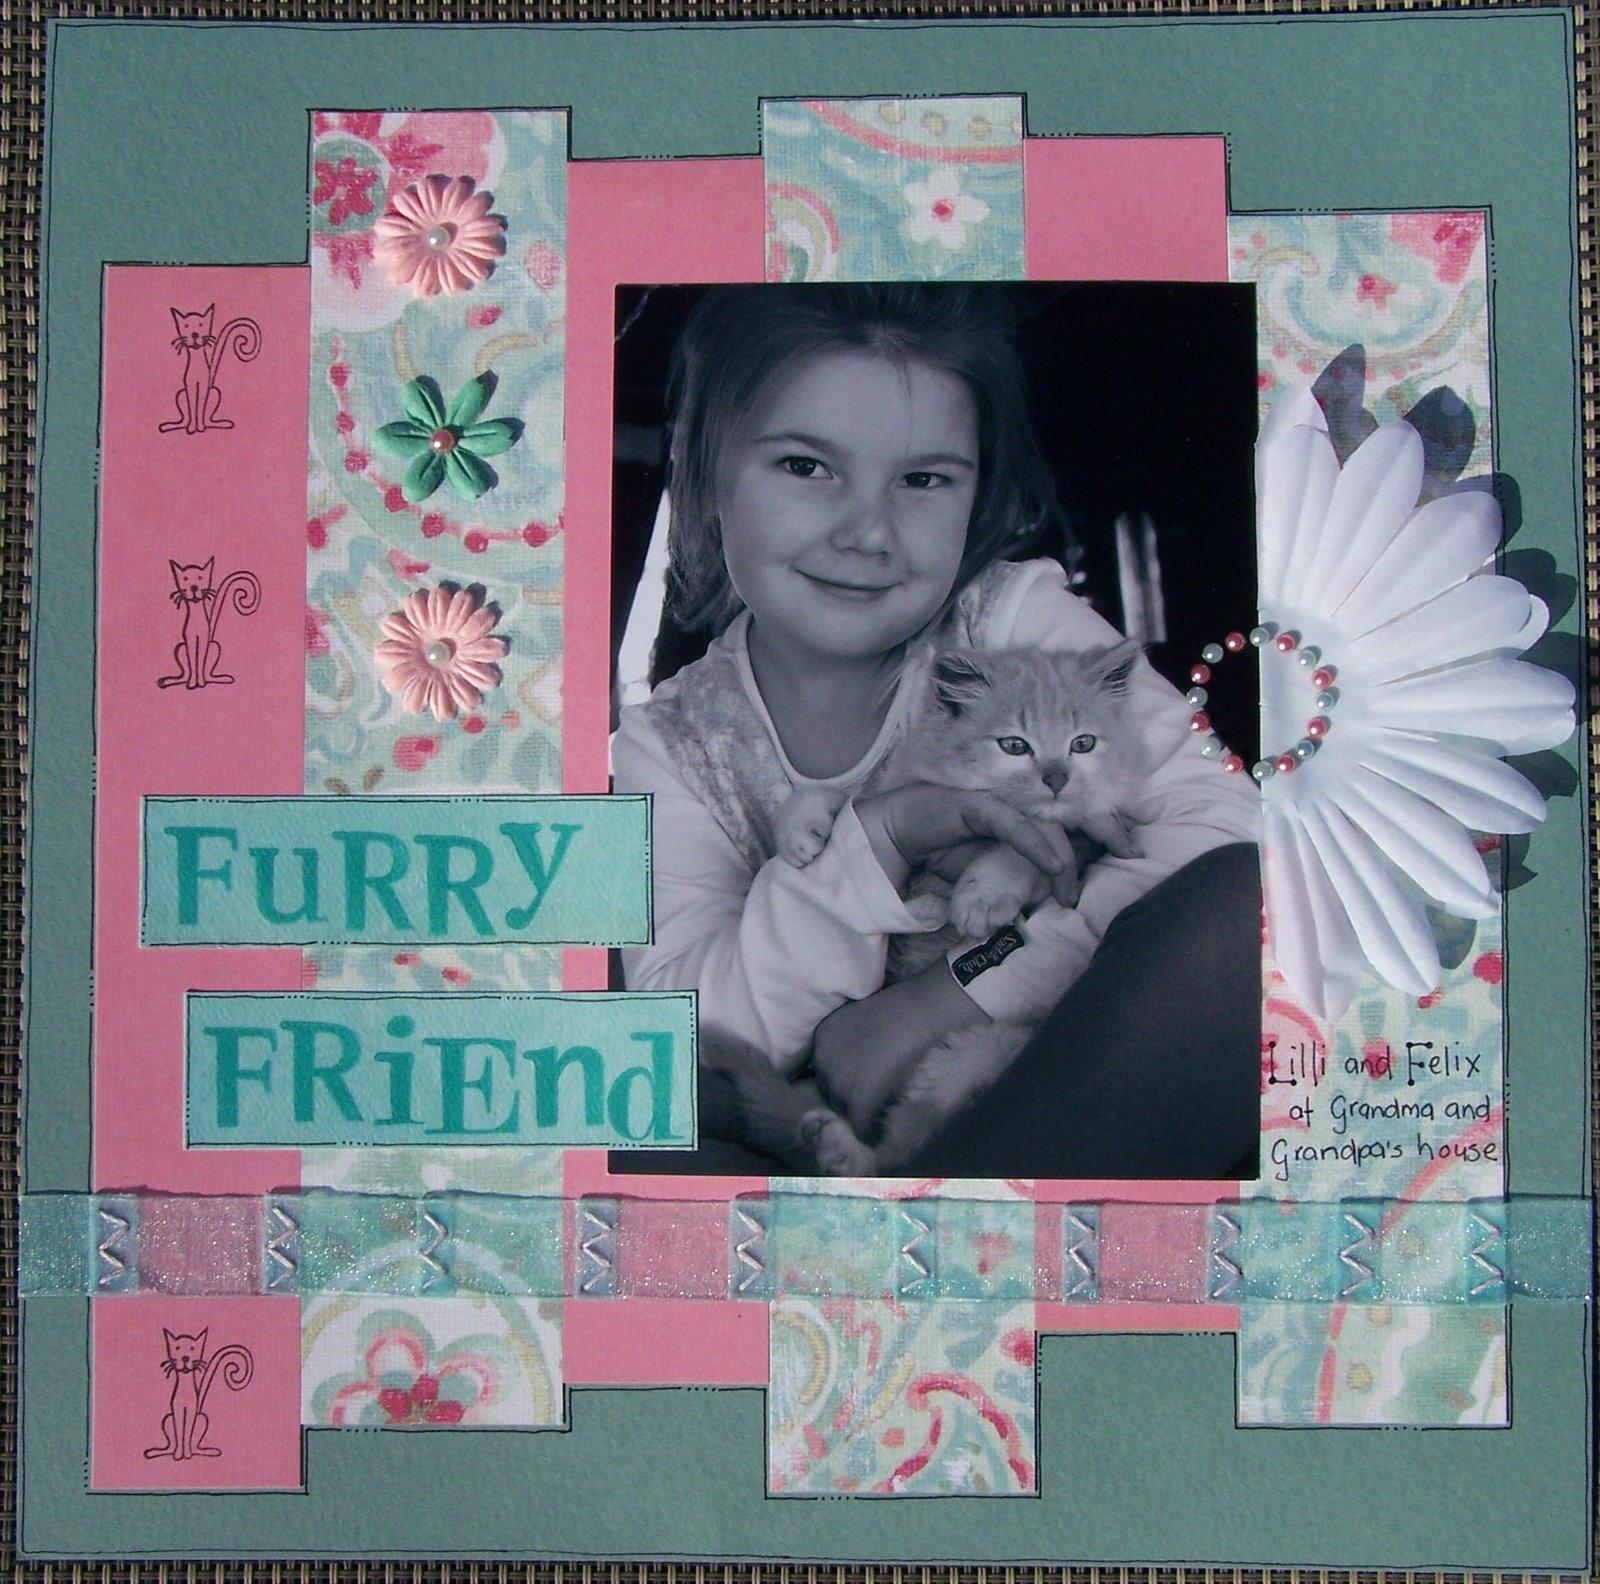 [Furry+friend.jpg]